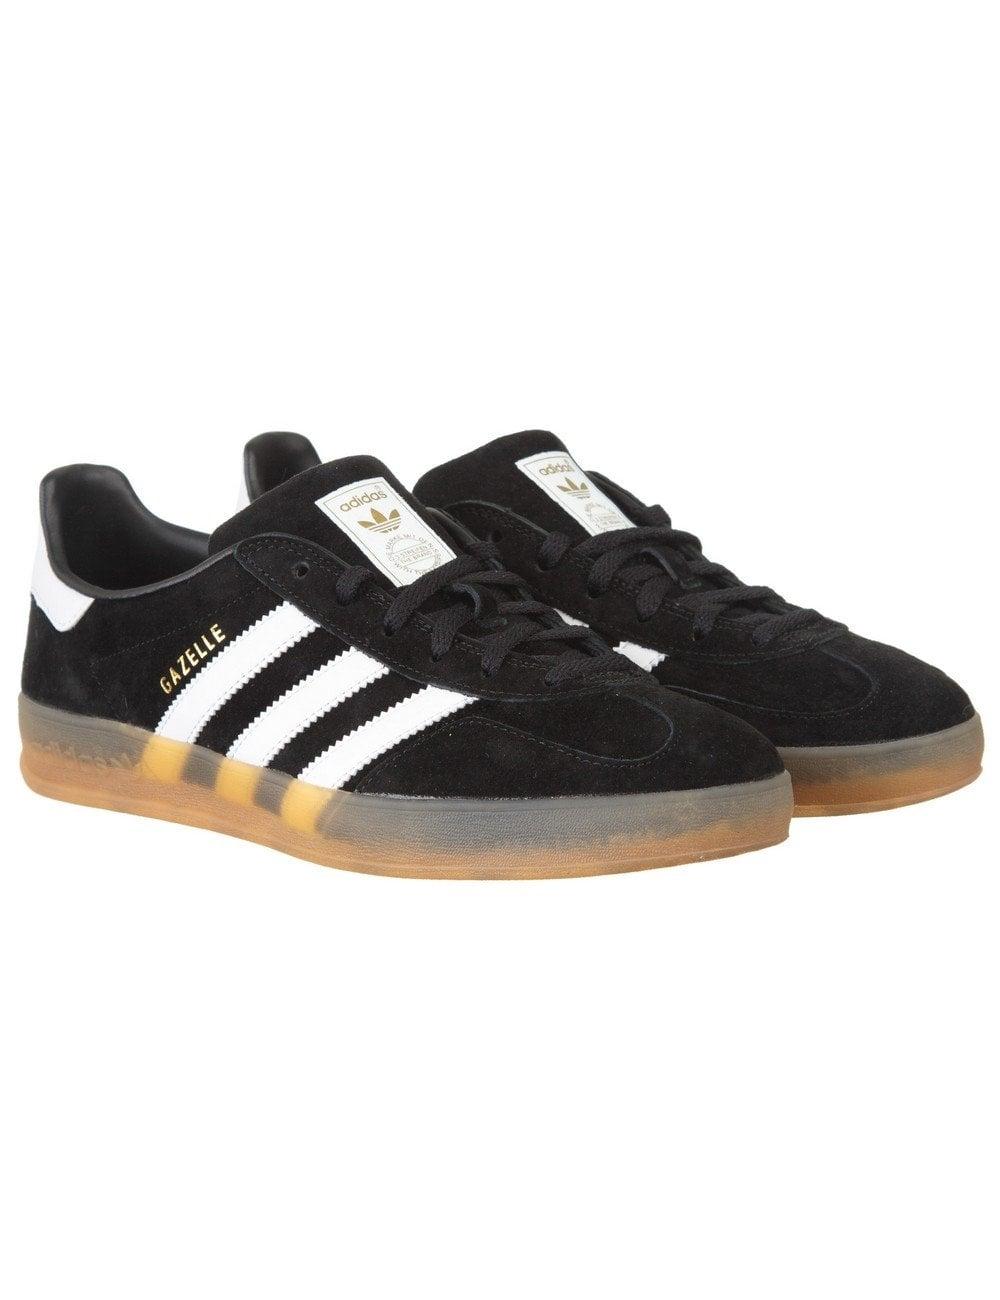 Gazelle Indoor Shoes - Black/White